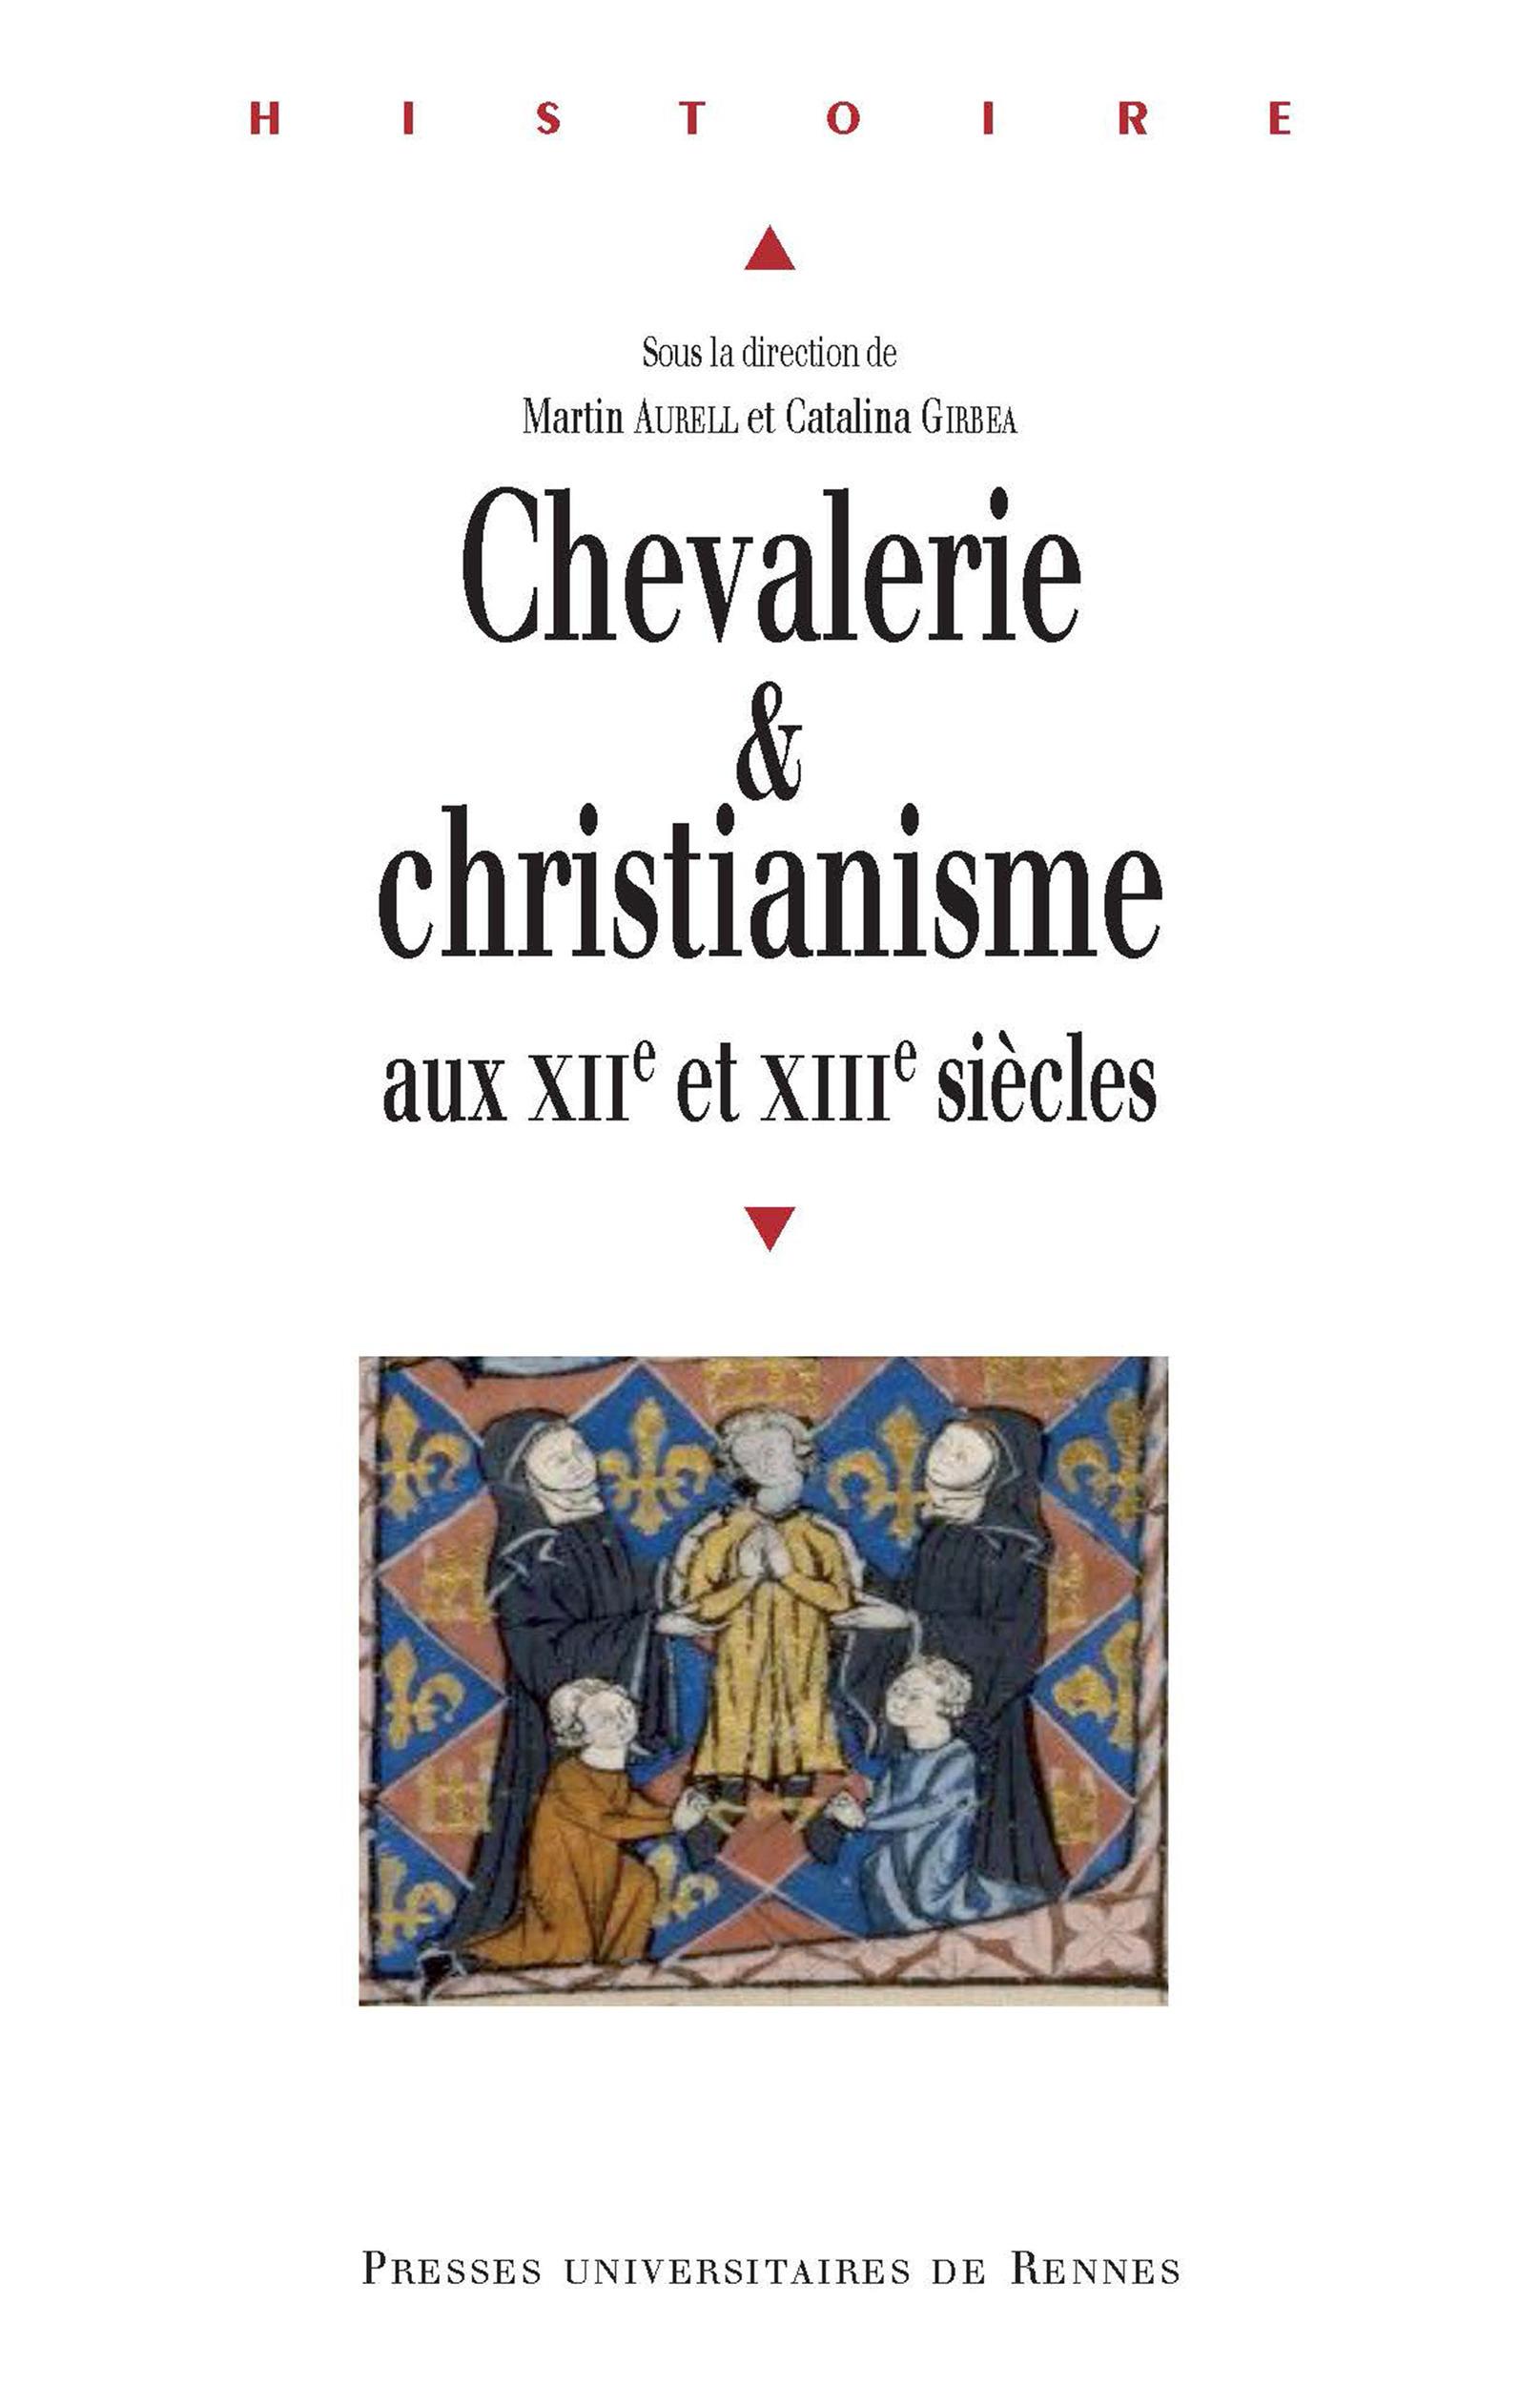 Chevalerie et christianisme aux XIIe et XIIIe siècles  - Catalina Girbea  - Martin Aurell